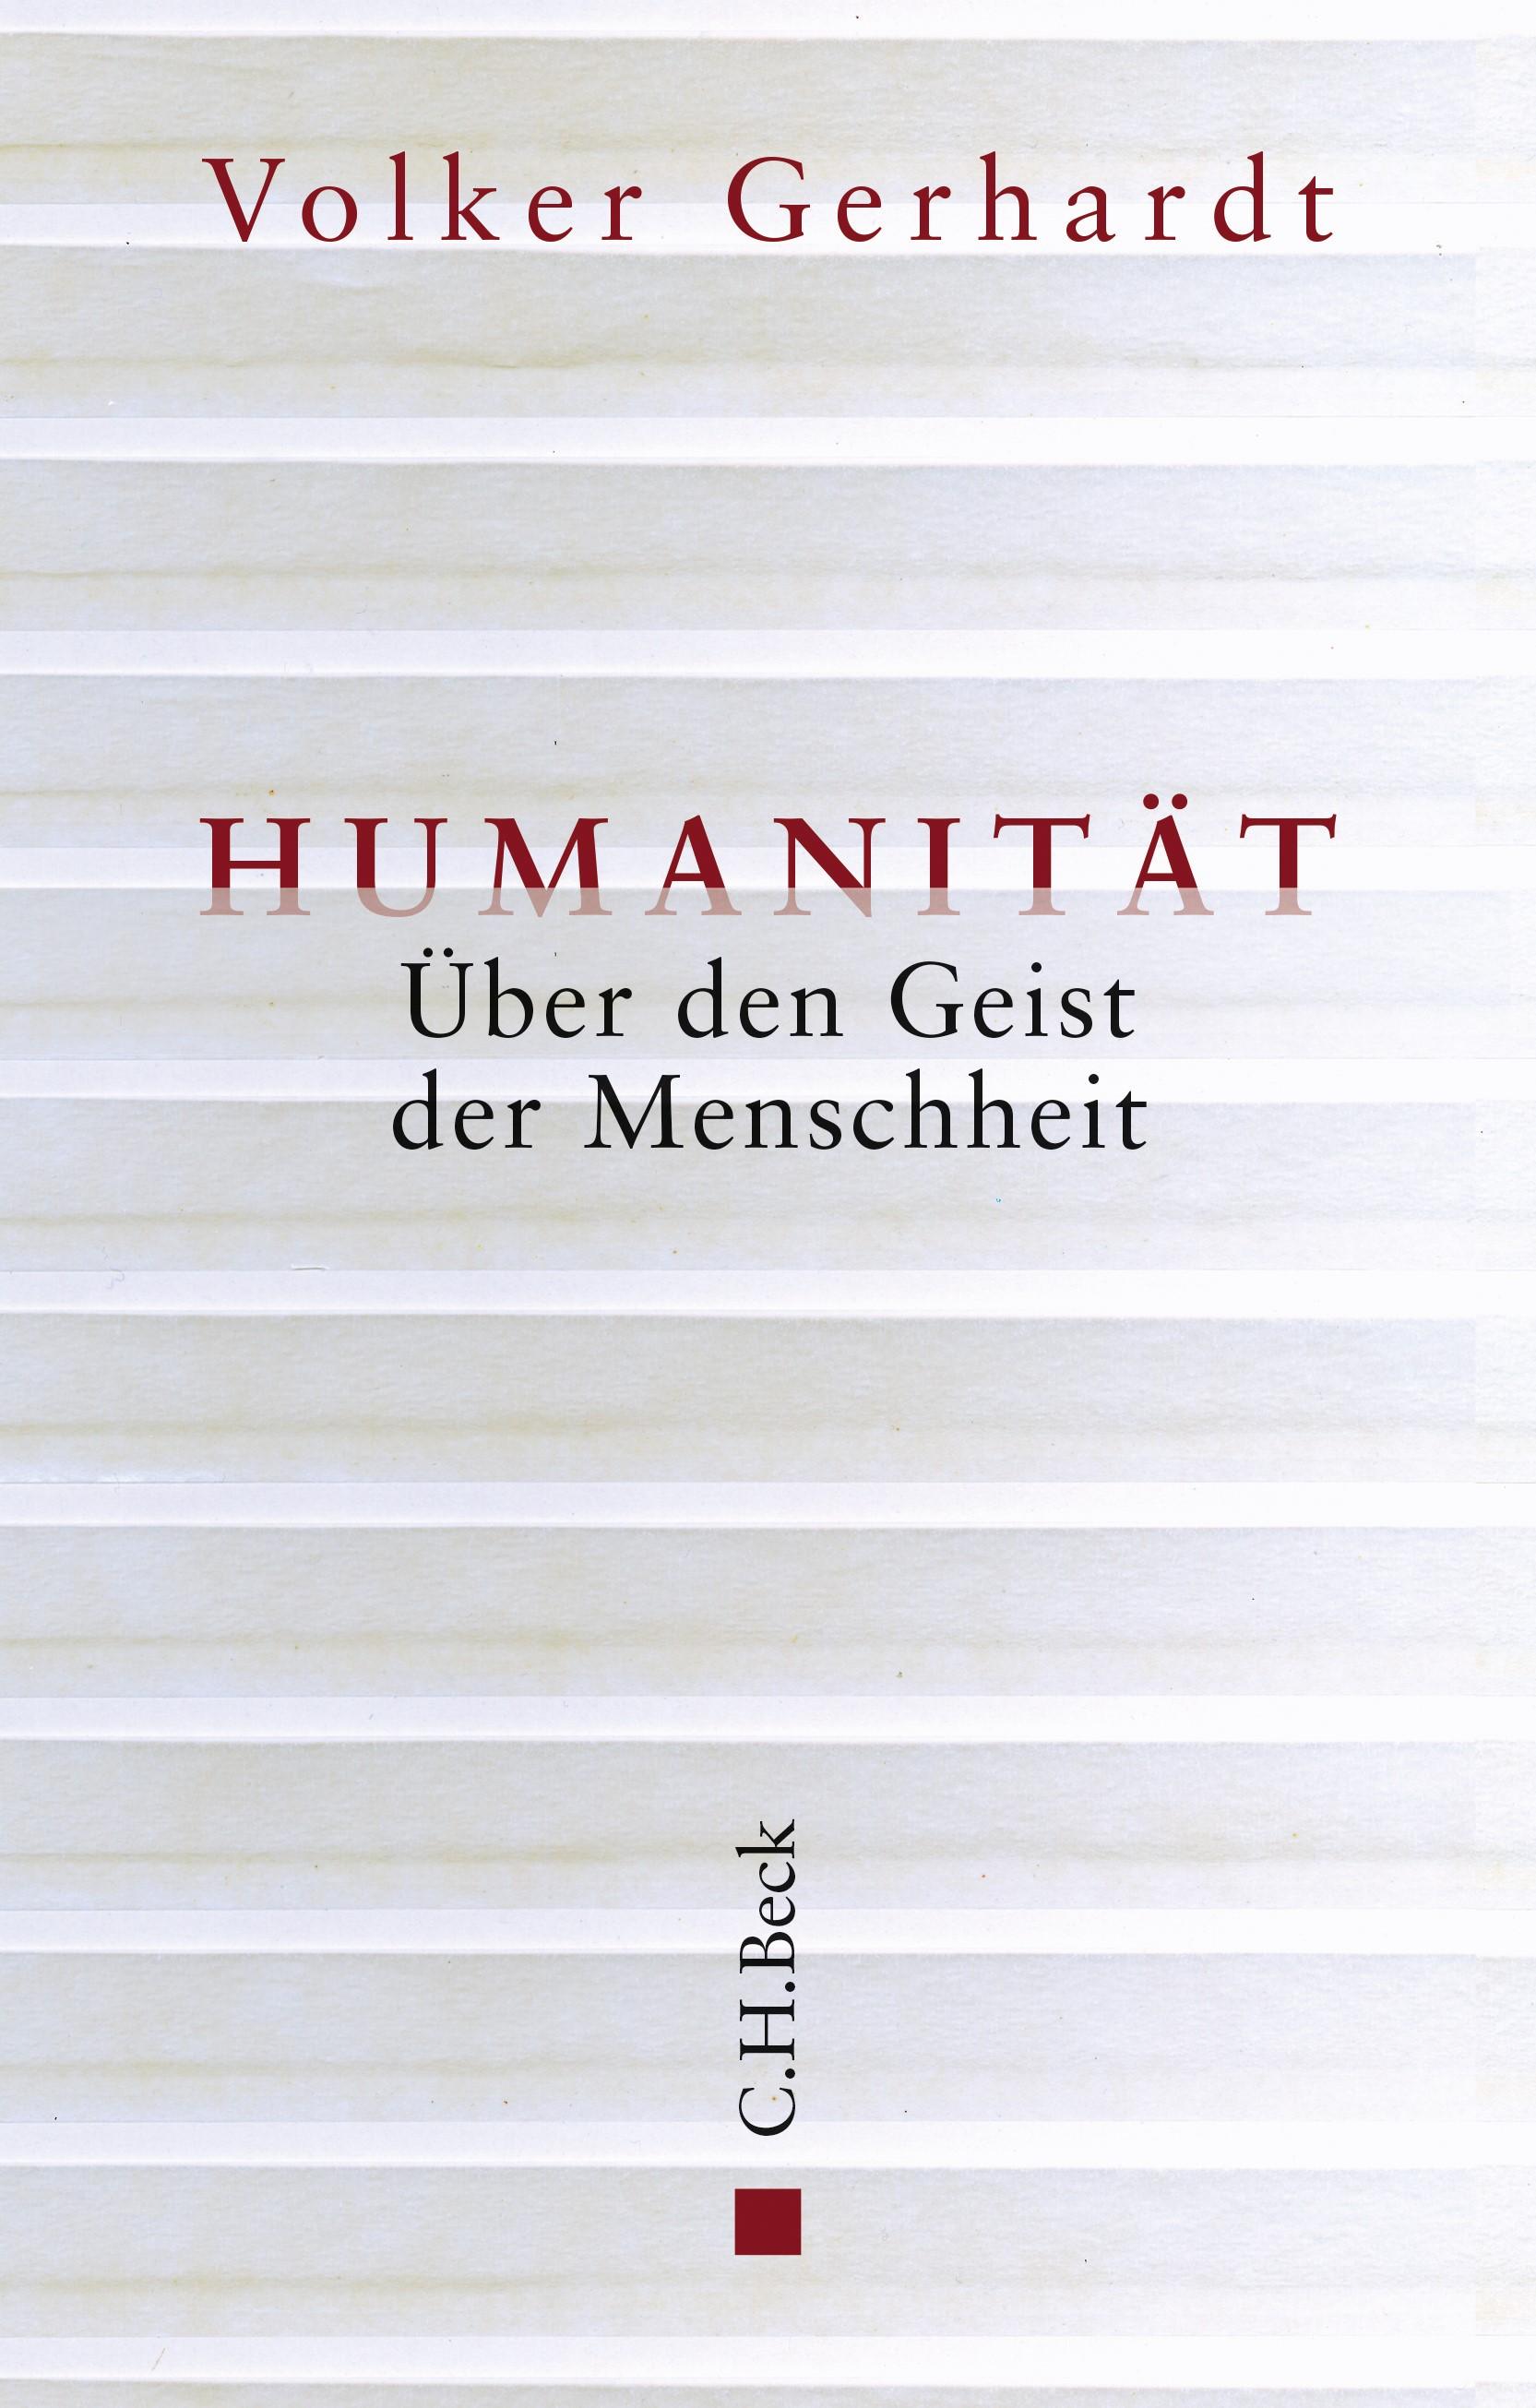 Humanität | Gerhardt, Volker, 2019 | Buch (Cover)